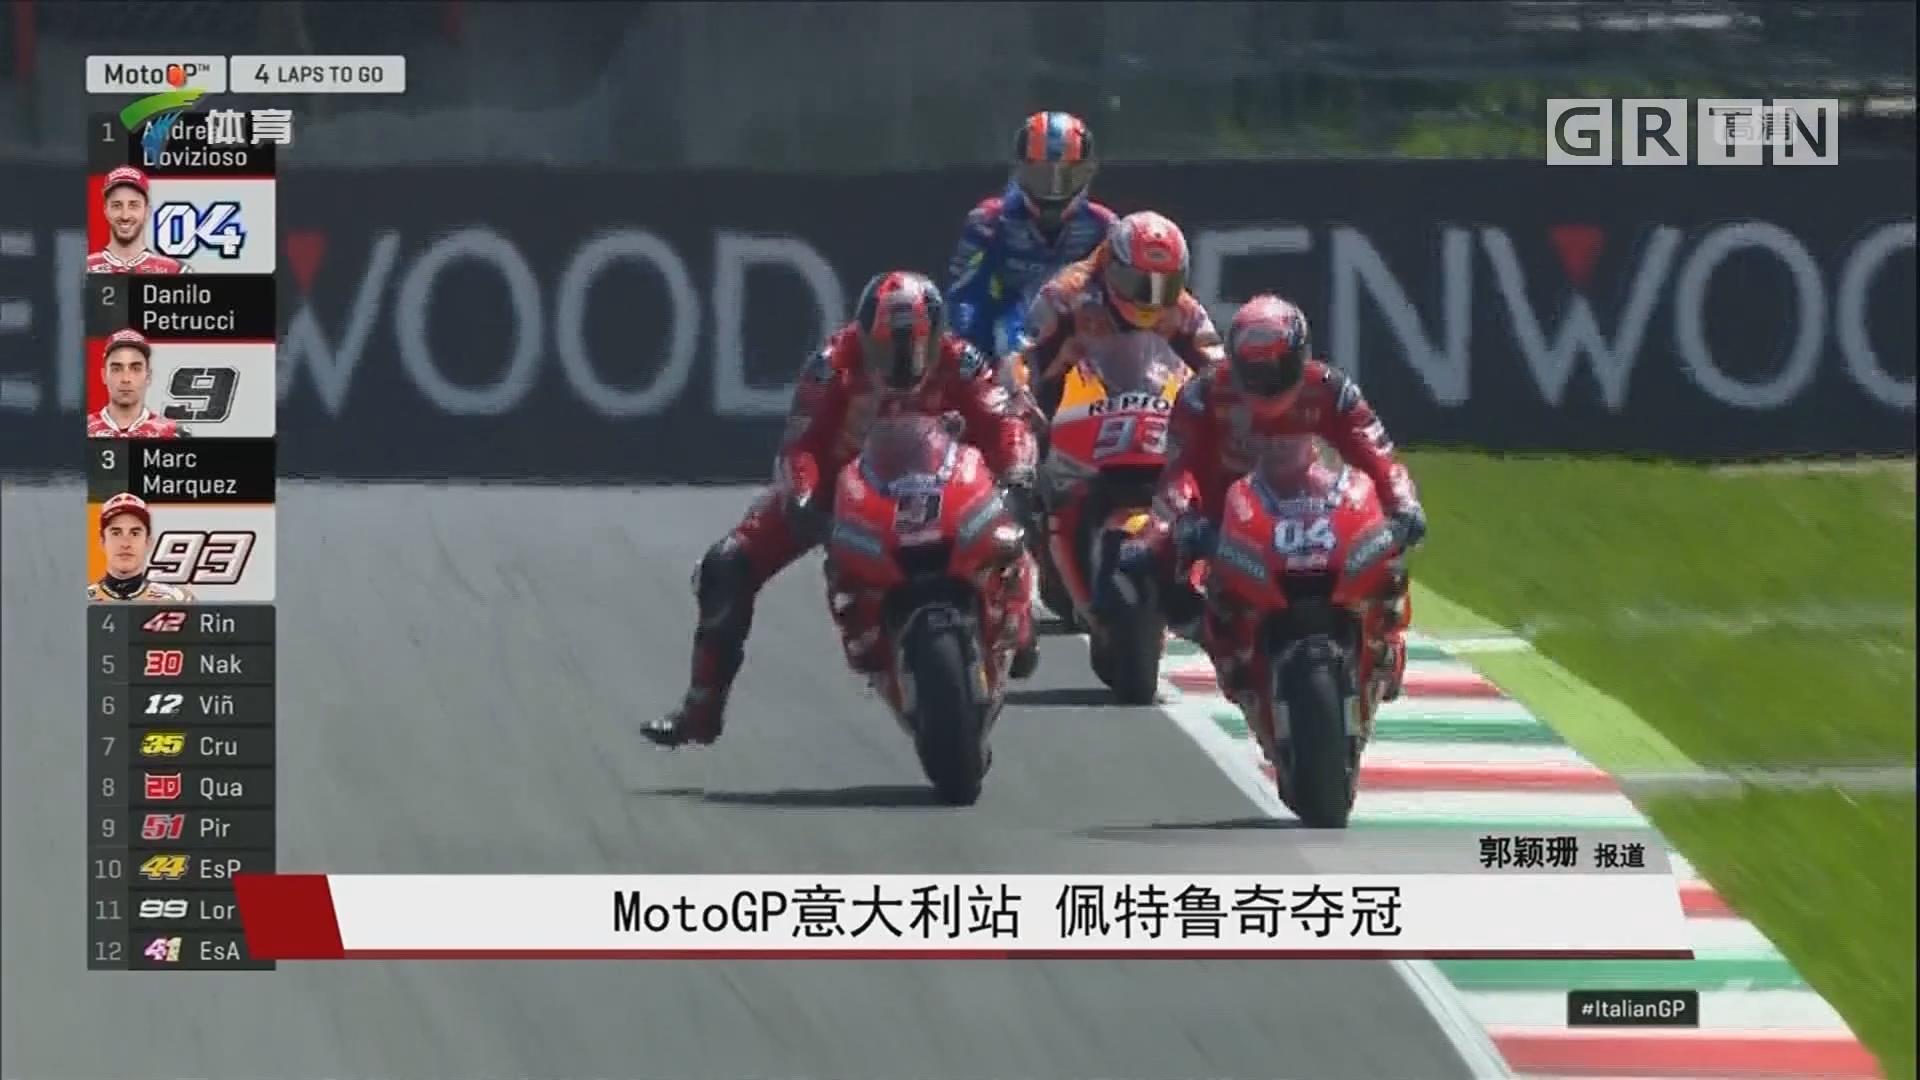 MotoGP意大利站 佩特鲁奇夺冠